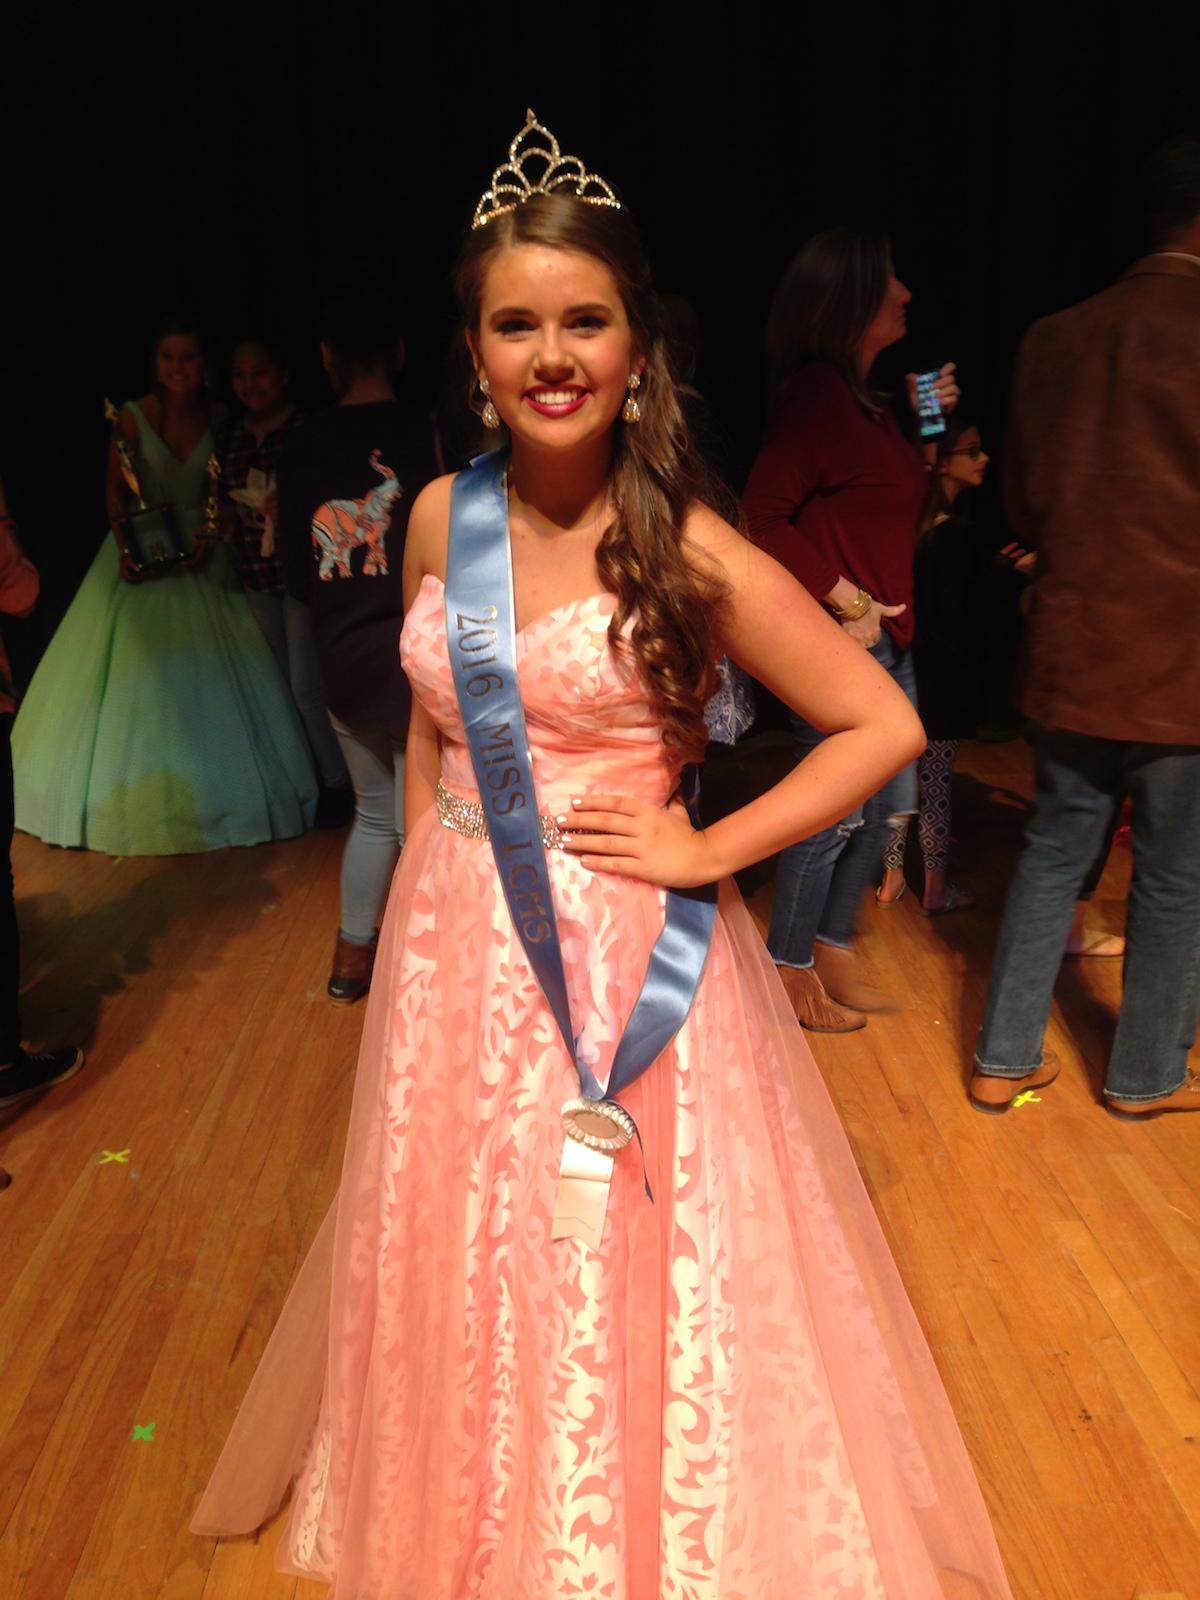 Congratulations Olivia Olsen!